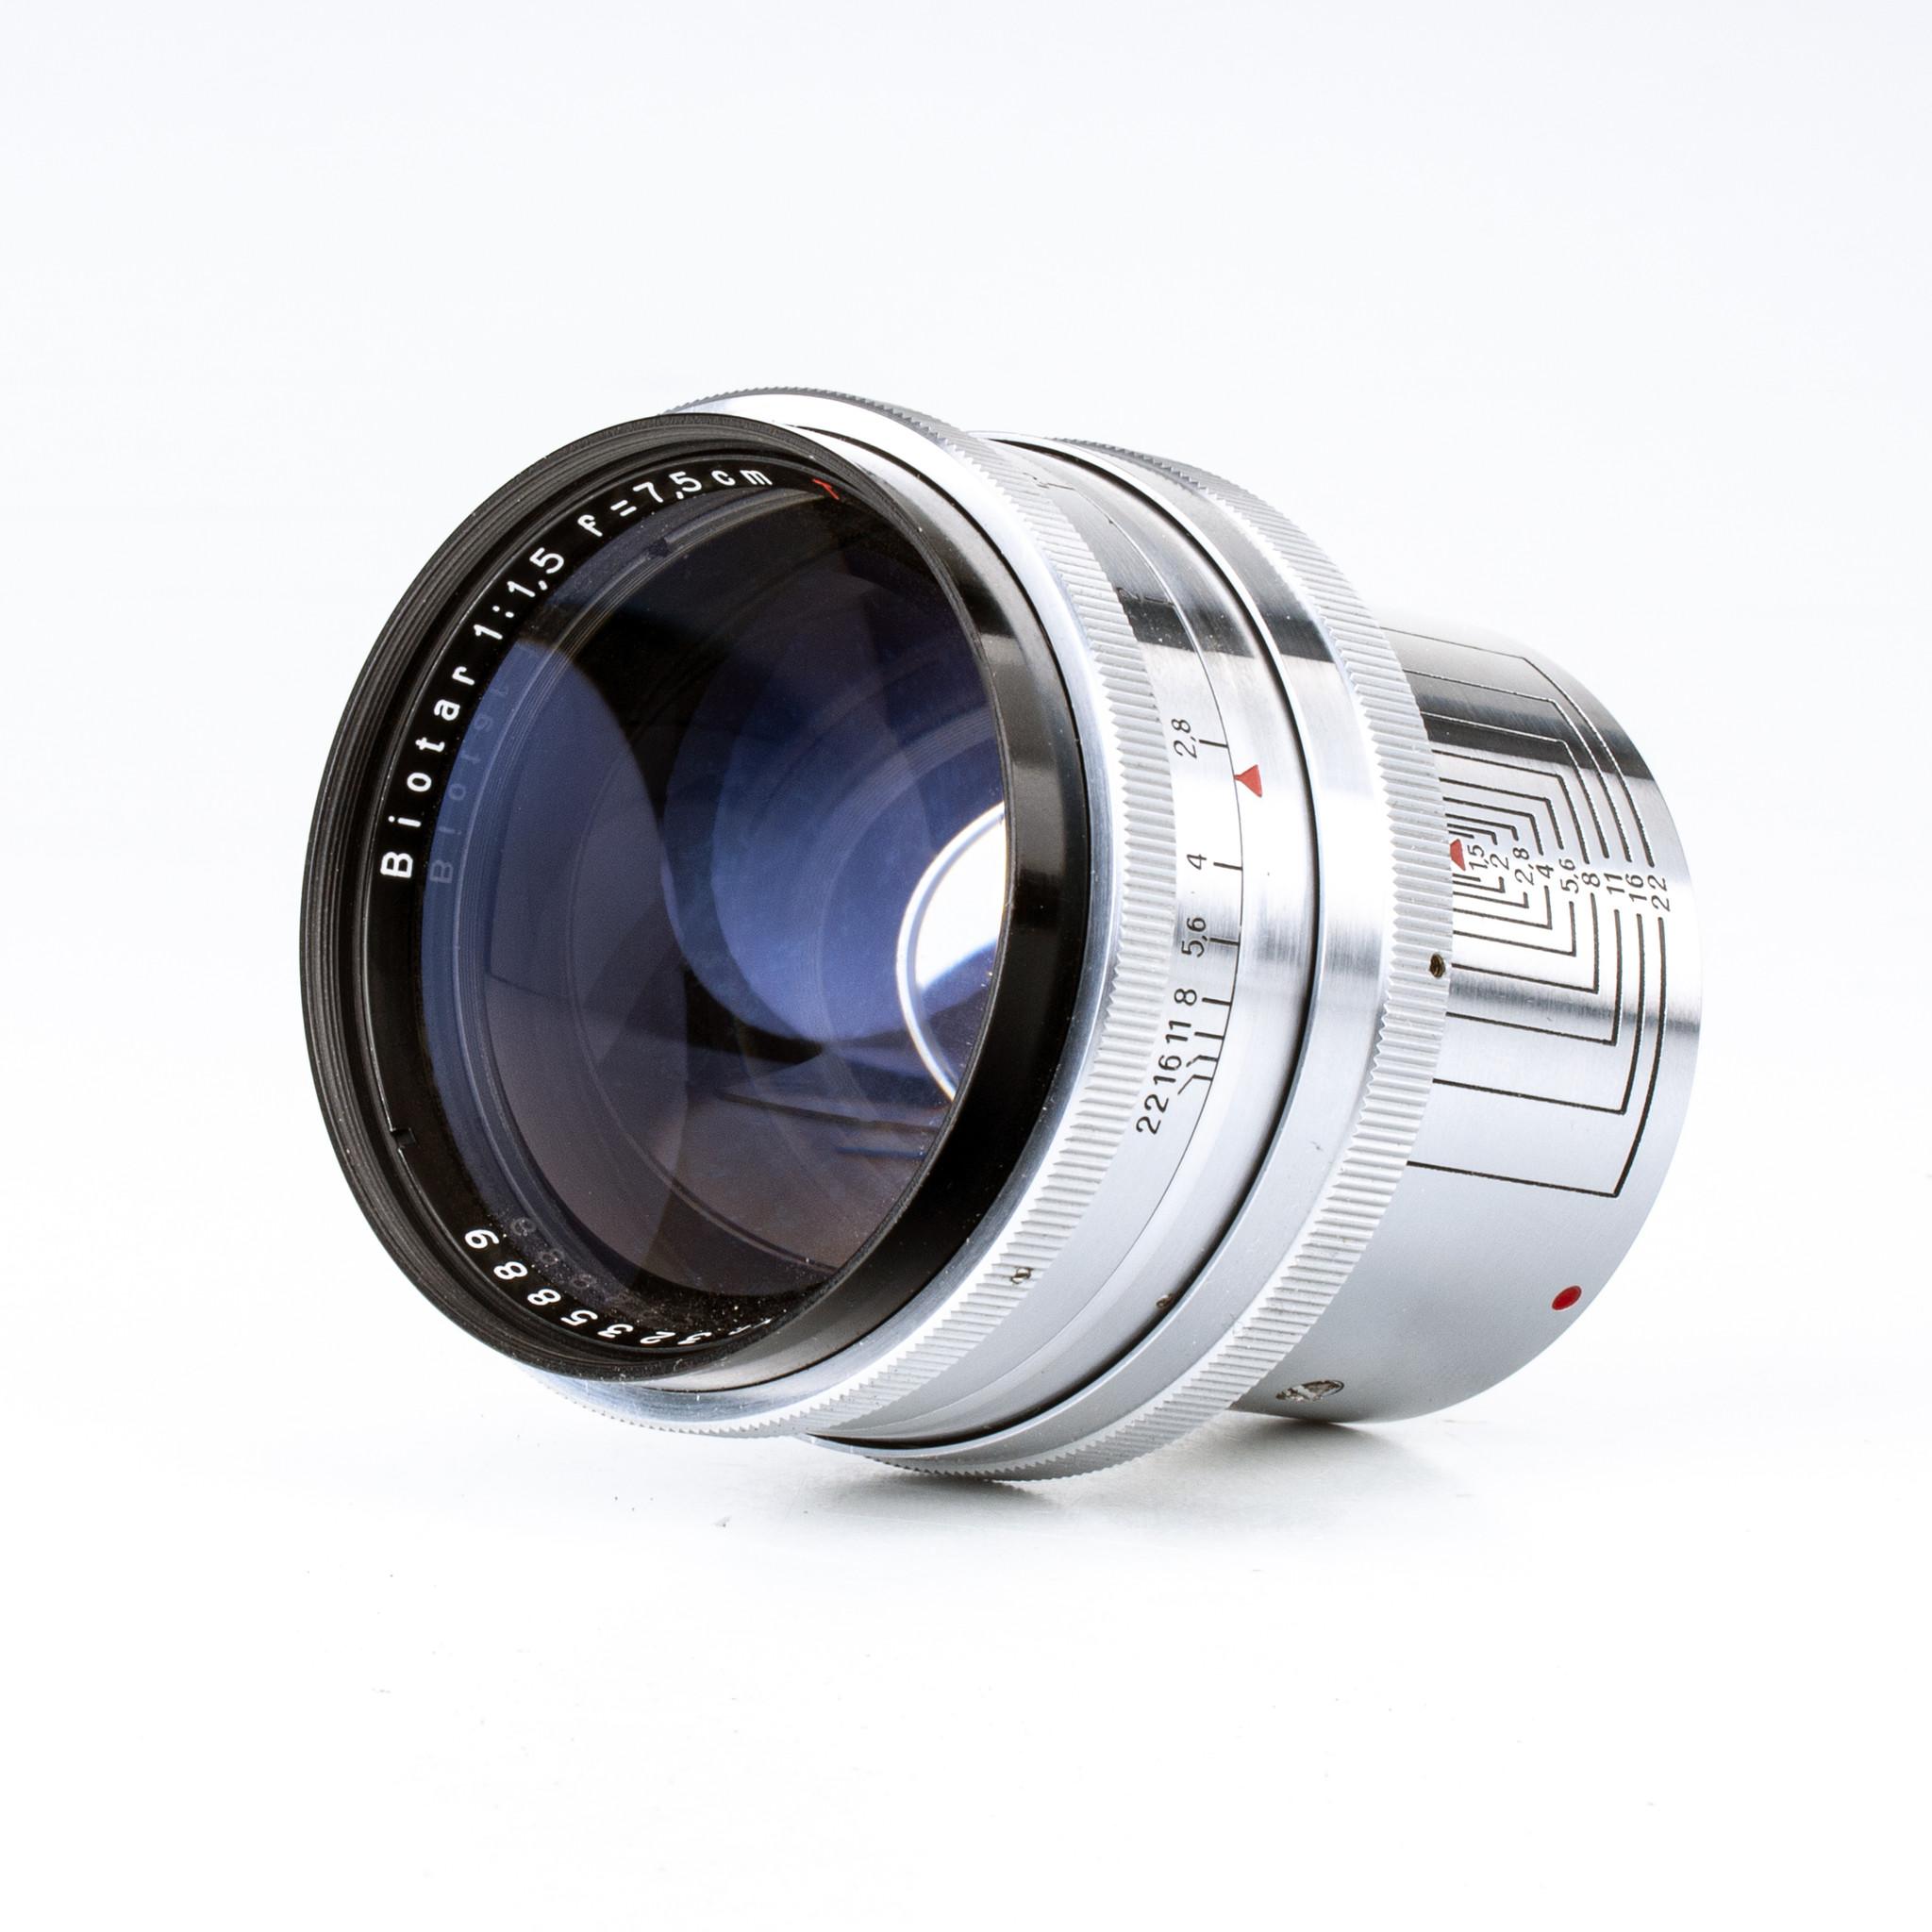 Zeiss Biotar 75mm f/1.5 V2